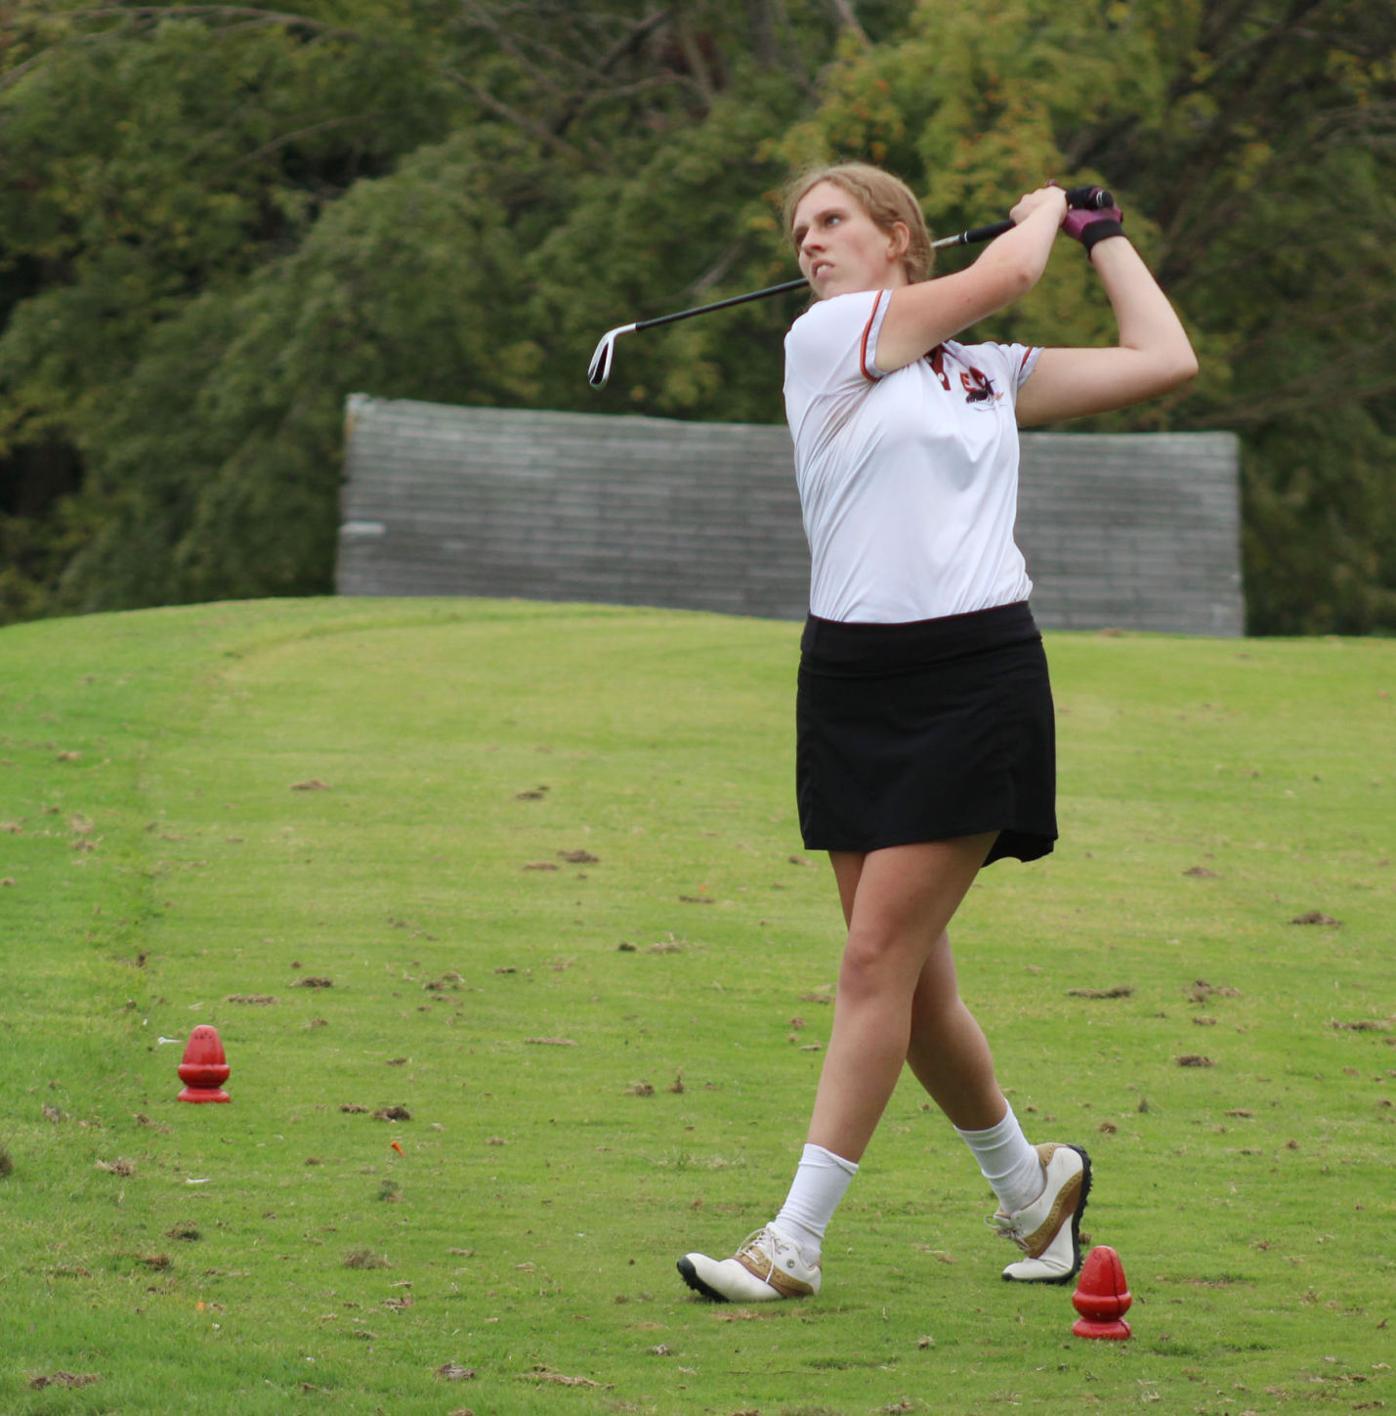 SOC Girls Golf - Lauren Bevins